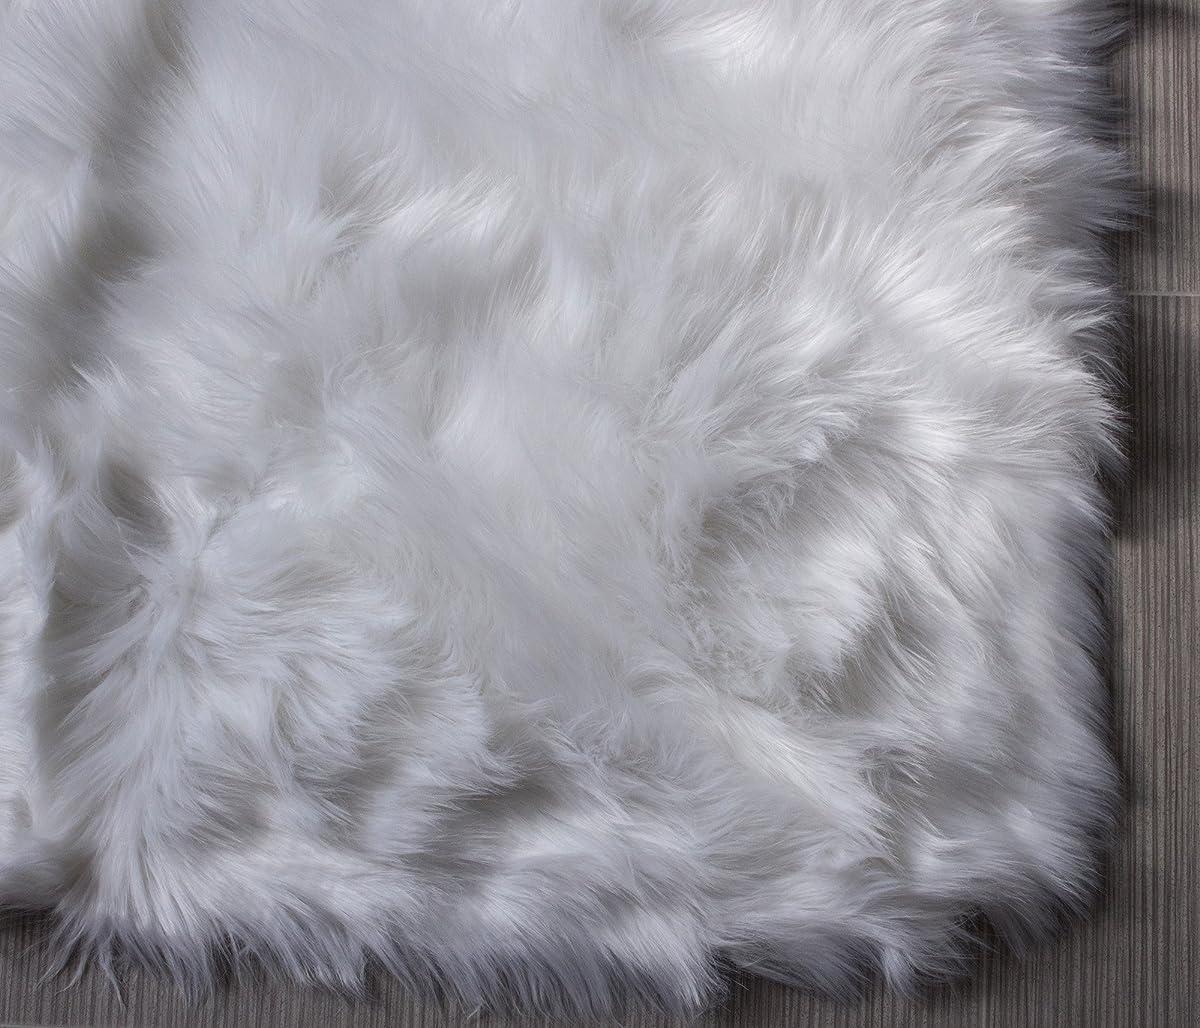 Super Area Rugs Soft Faux Fur Sheepskin Shag Silky Rug Baby Nursery Childrens Room Rug Ivory White, 3 x 5